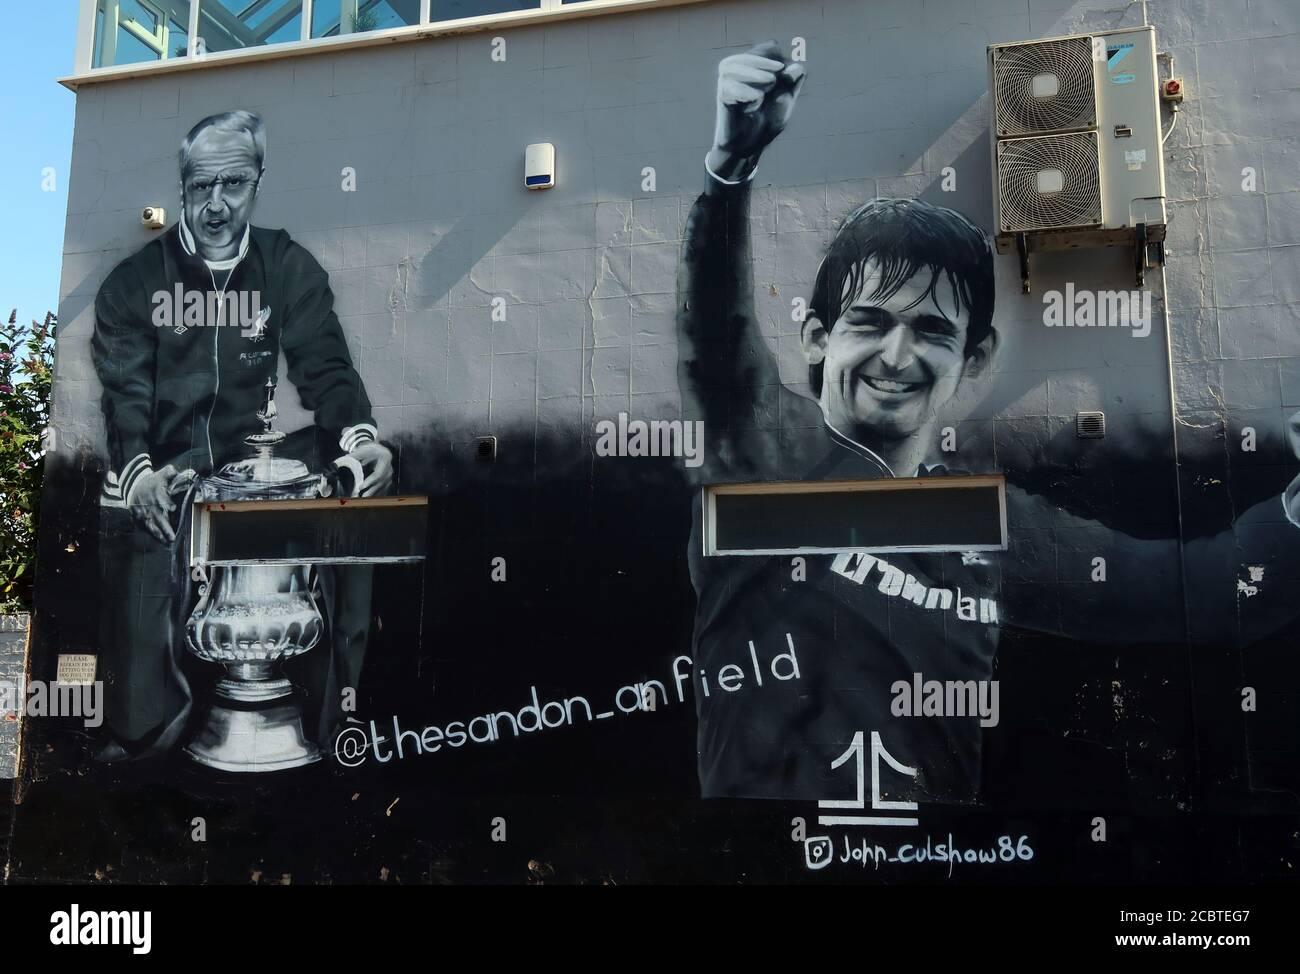 GoTonySmith,HotpixUK,@HotpixUK,England,UK,Britain,Great Britain,Liverpool,city centre,Merseyside,L4,Ground,Stadia,Stadium,Youll Never walk alone,Never Walk alone,reds,the reds,football,Premier League